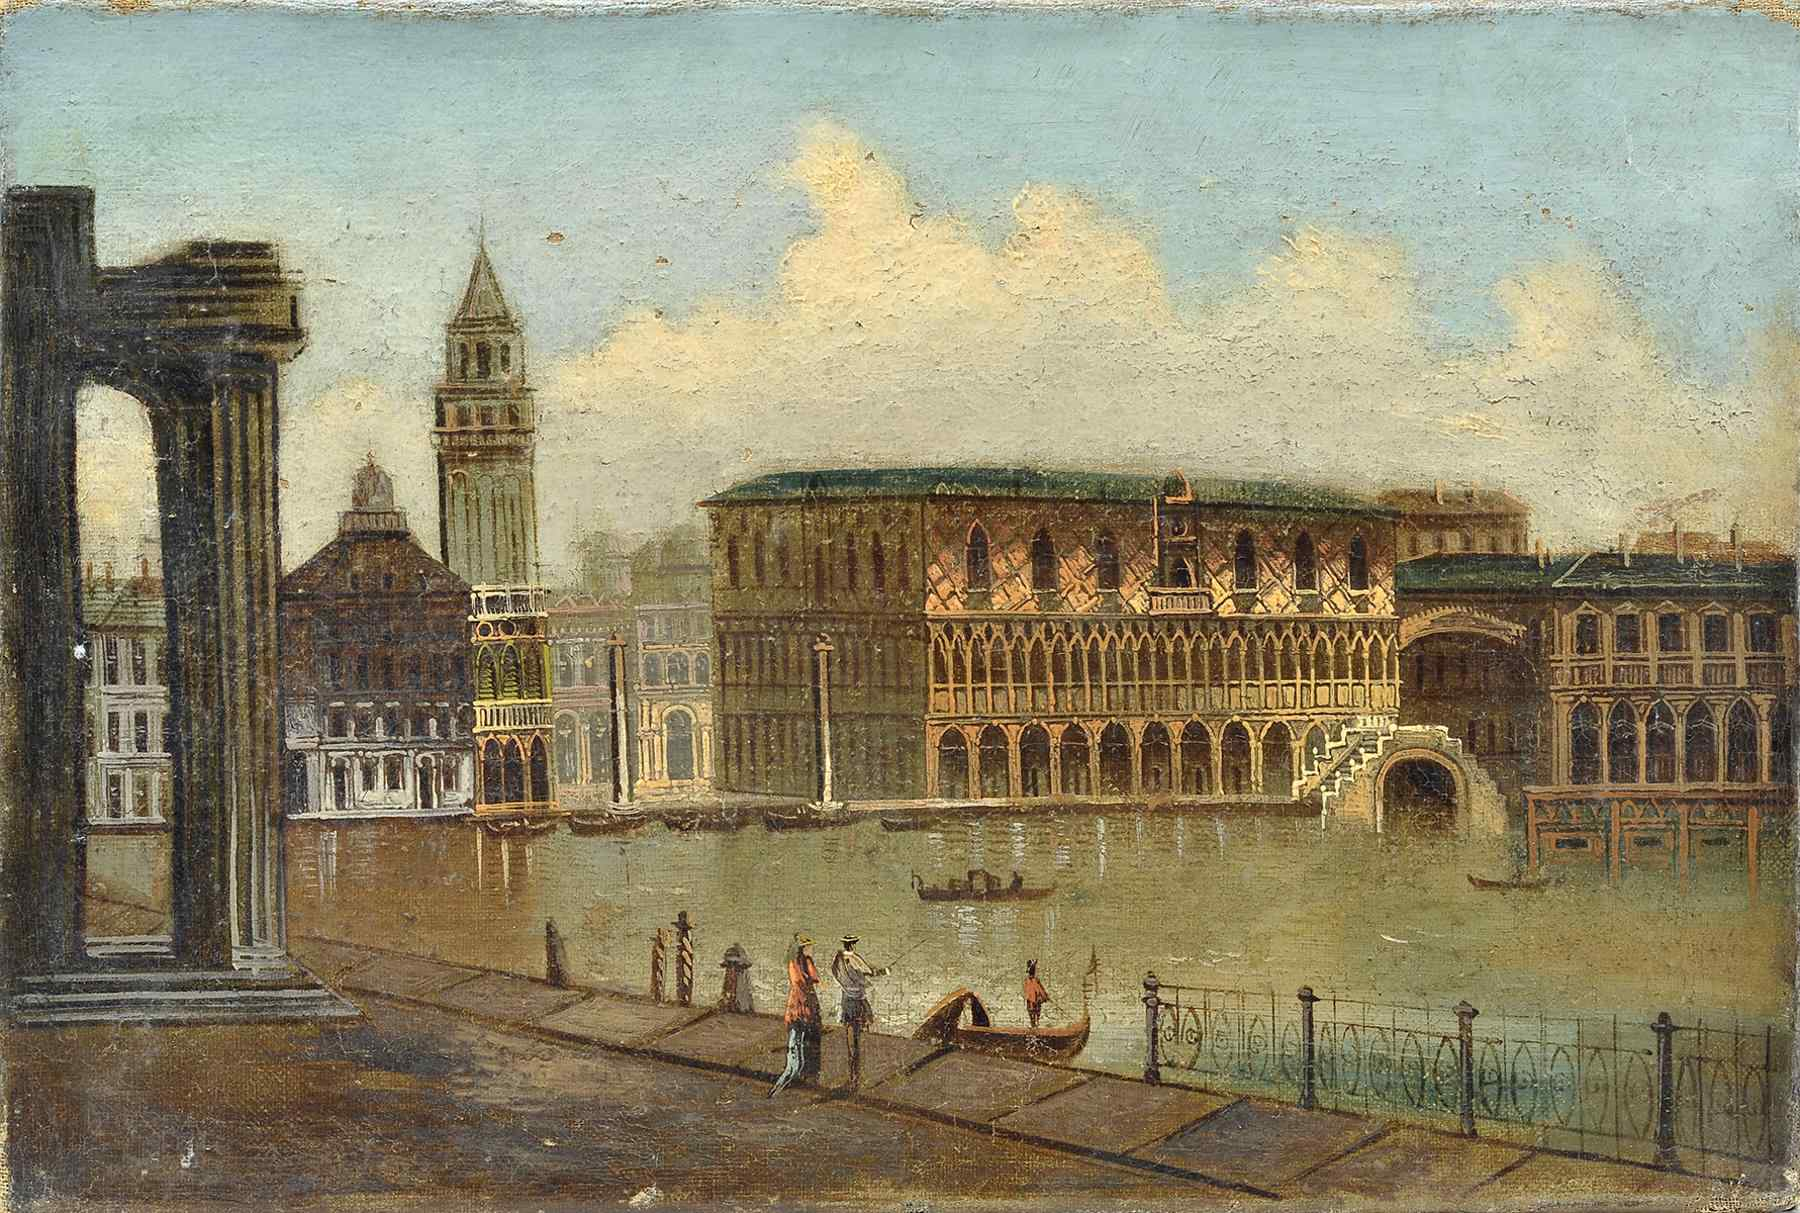 Quadro Scuola Italiana fine 700 Sec.XVIII